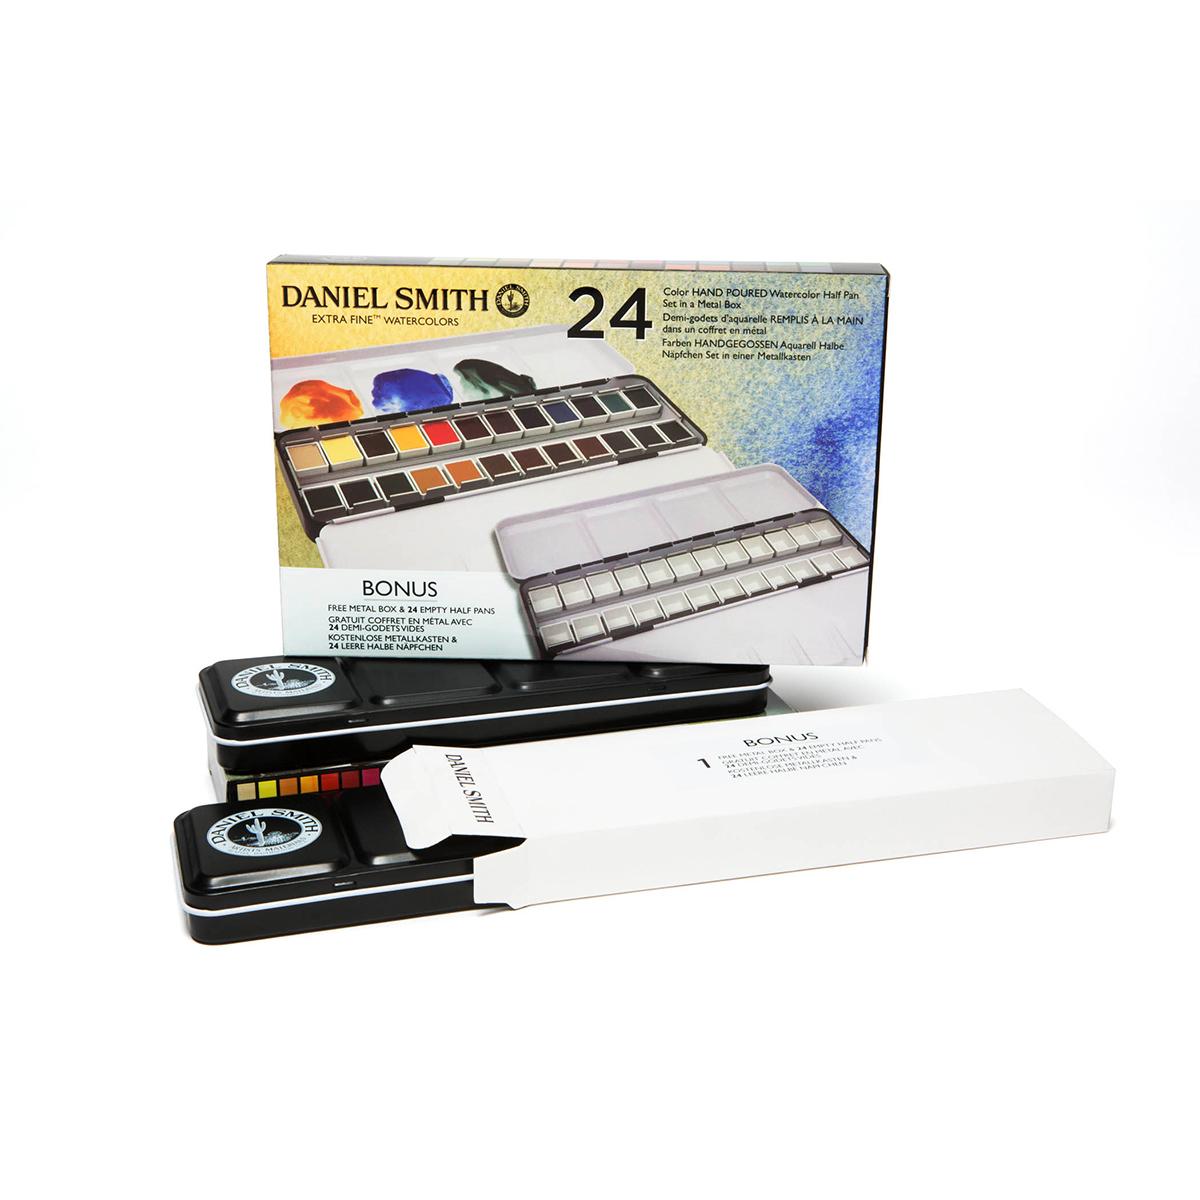 DANIEL SMITH 24色 ハーフパンセット 出荷 スミス ダニエル メタルボックス入り 水彩絵具 !超美品再入荷品質至上!